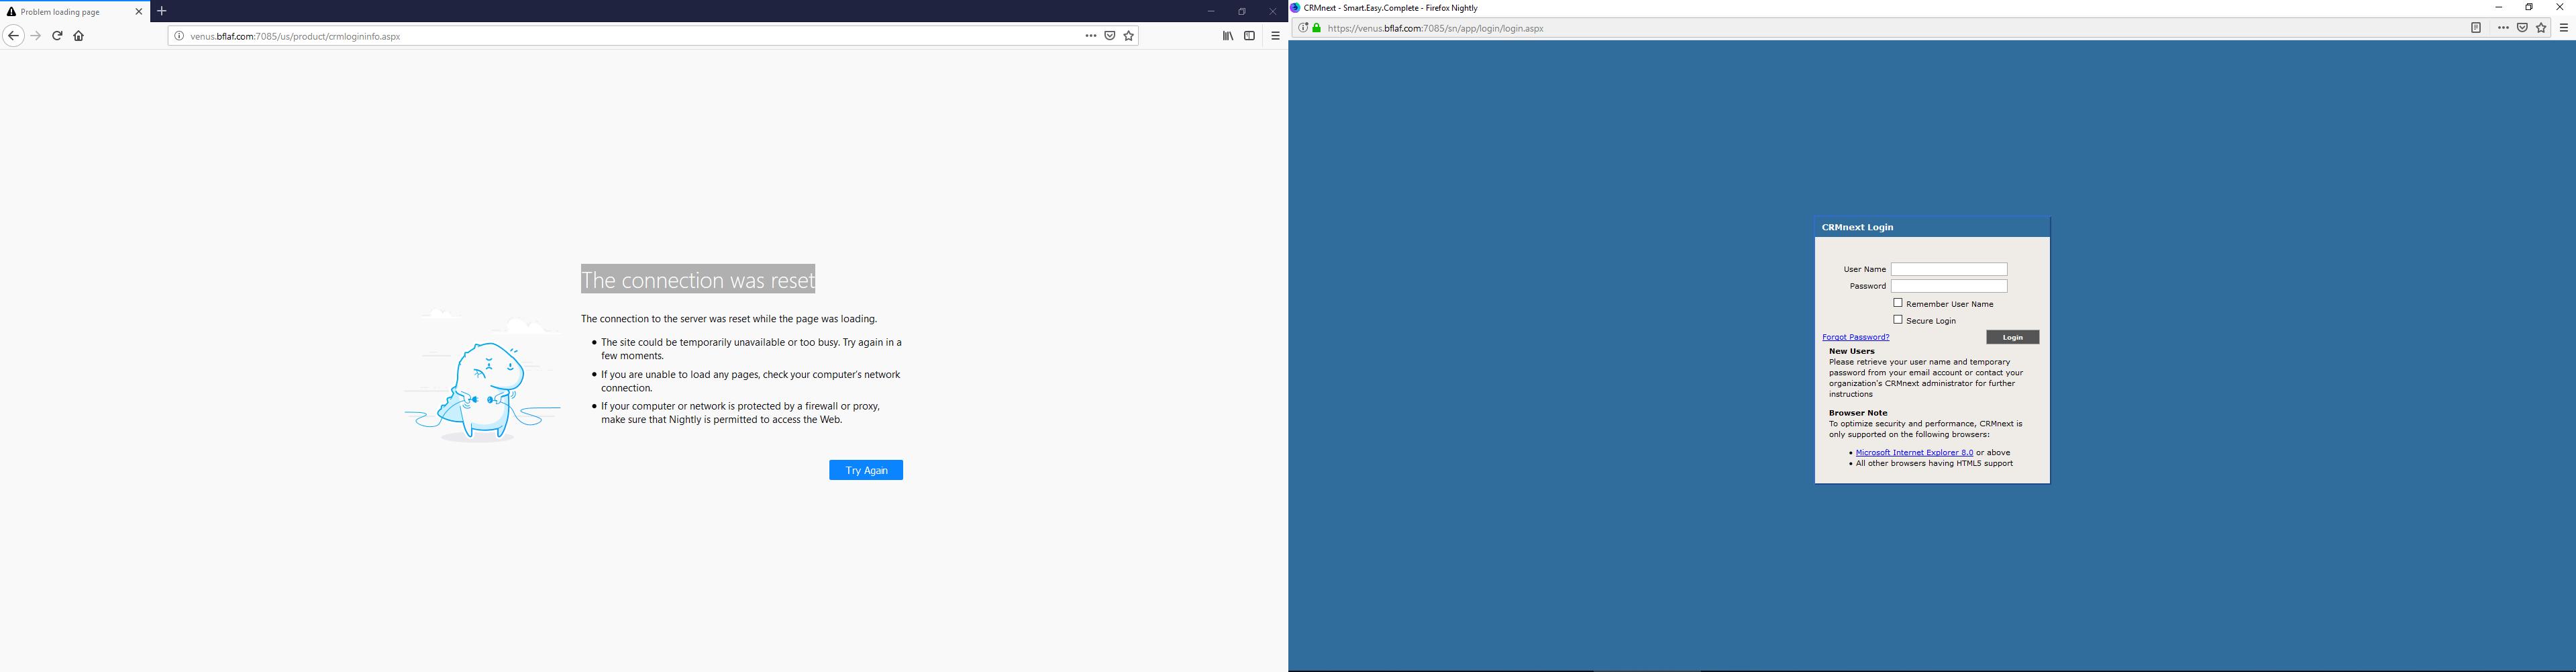 venus bflaf com:7085 - see bug description · Issue #20486